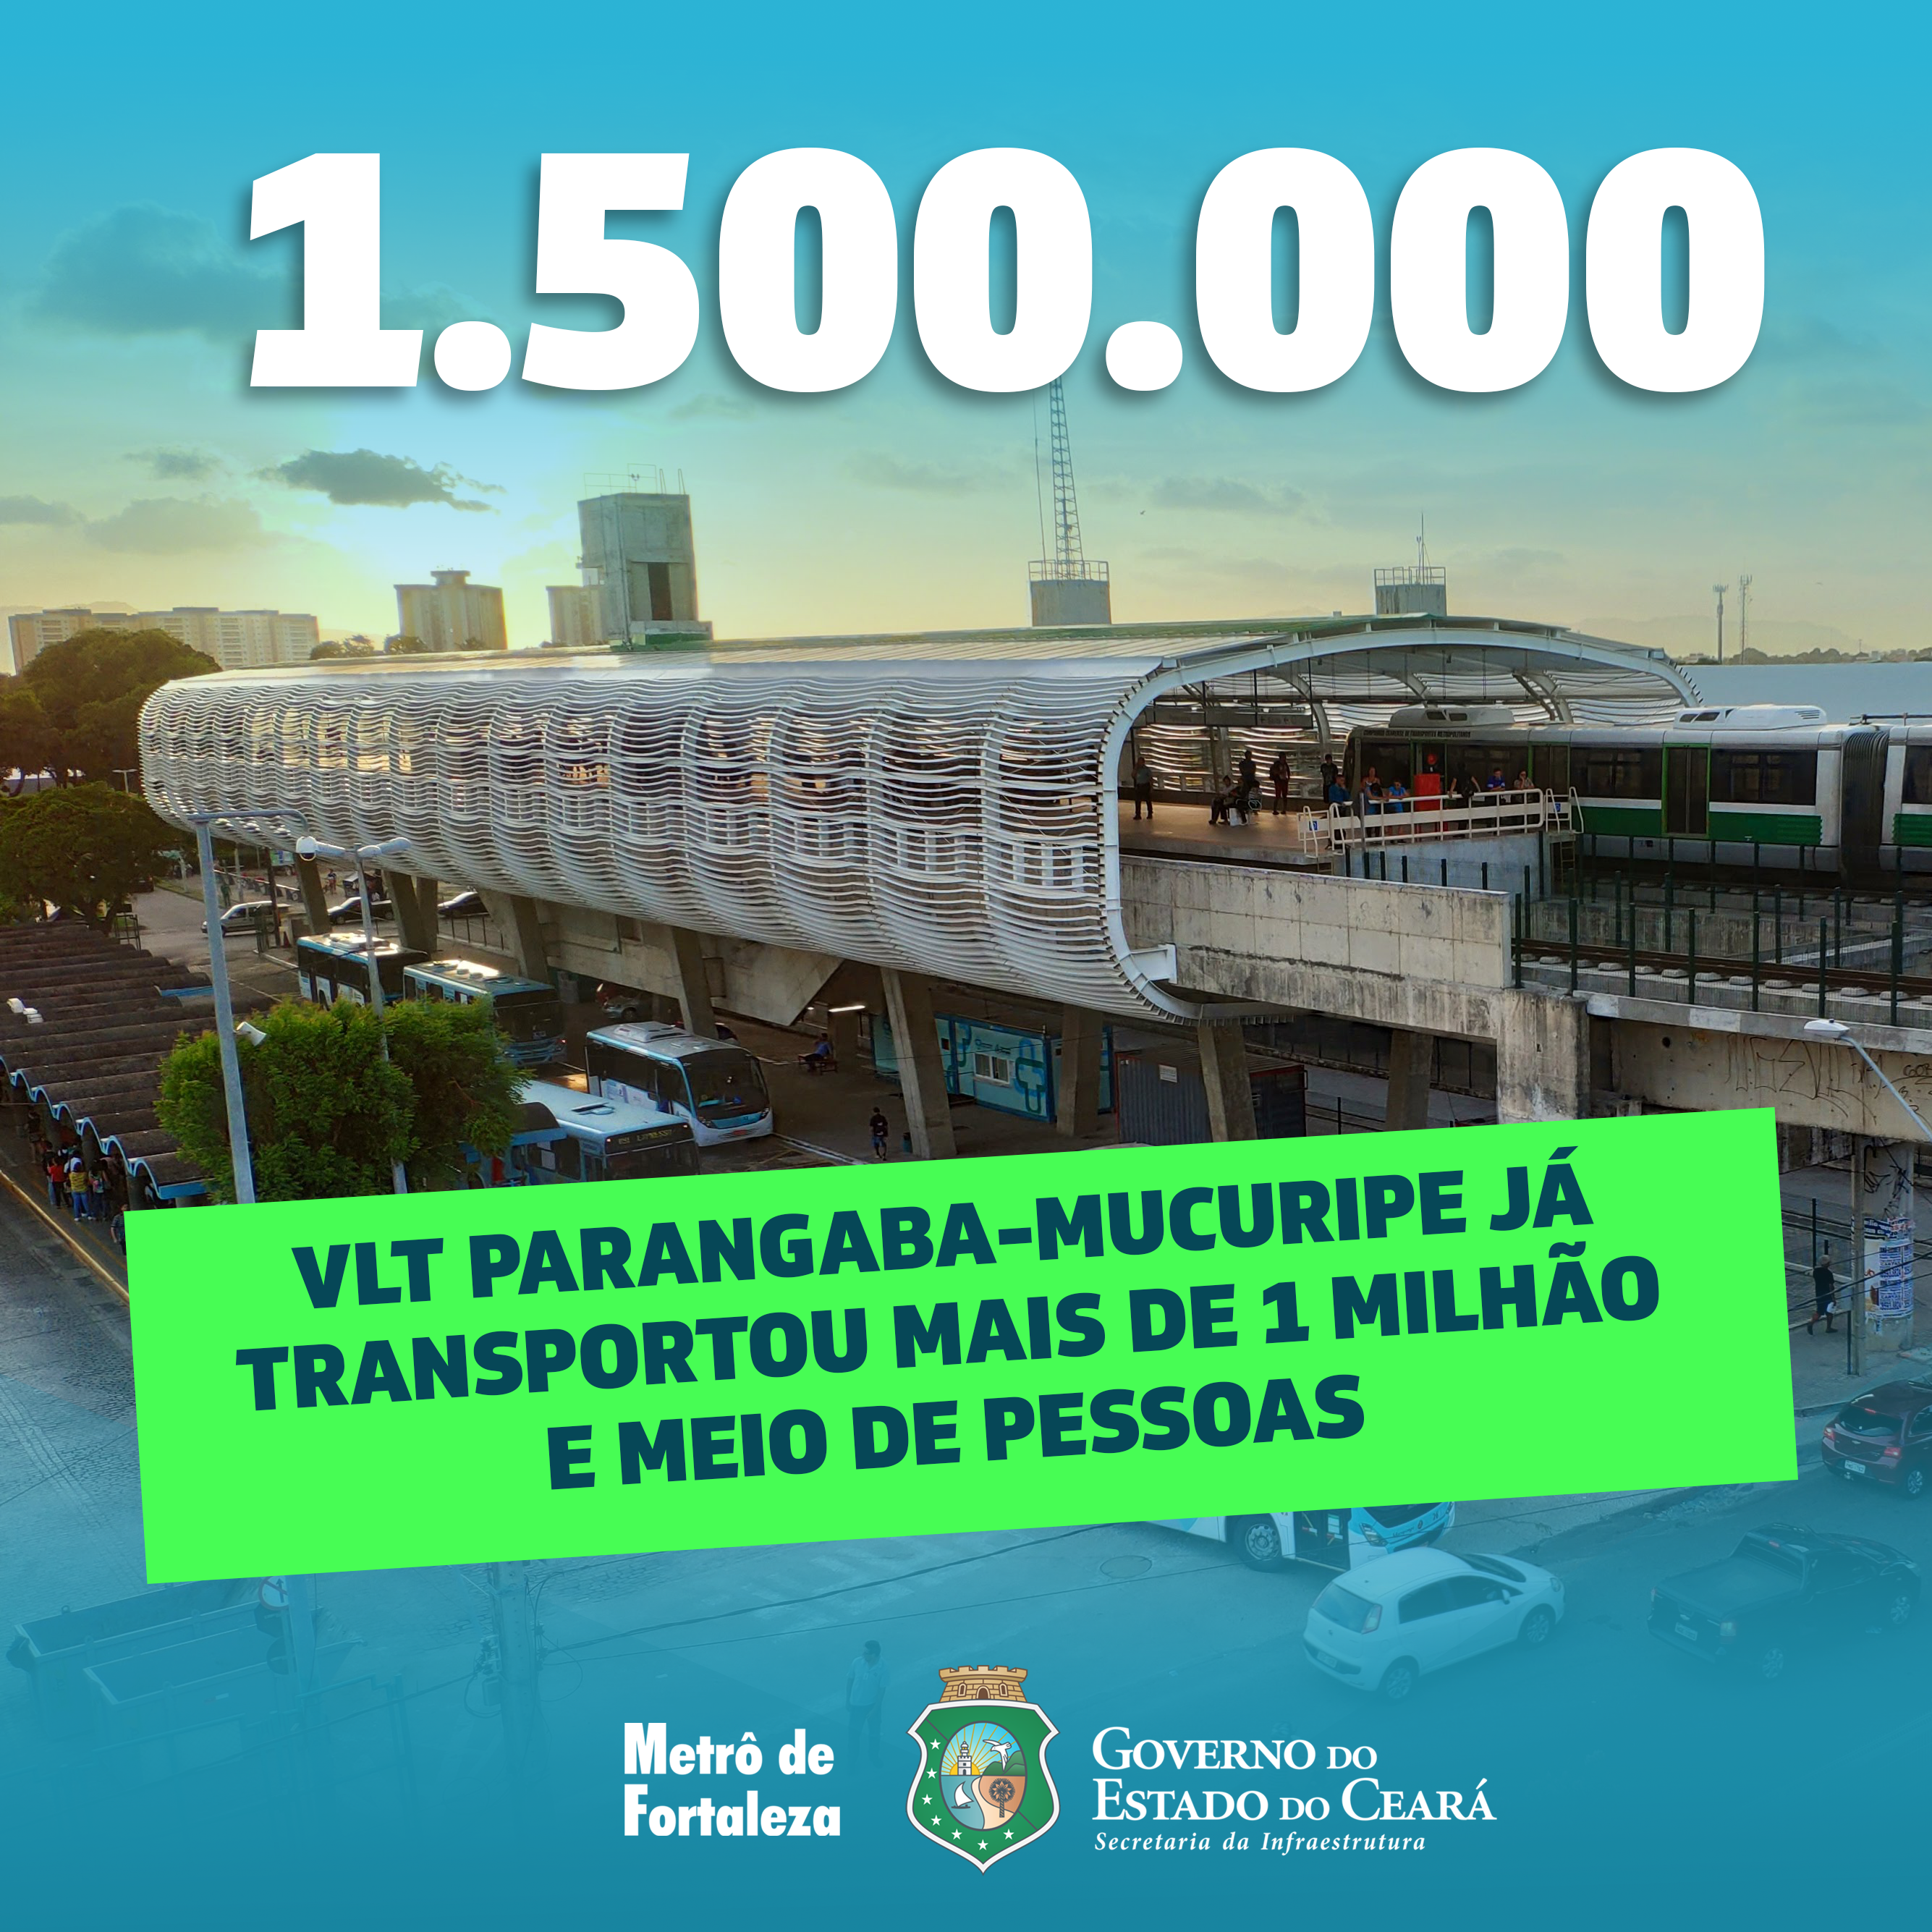 Banner VLT Parangaba-Mucuripe